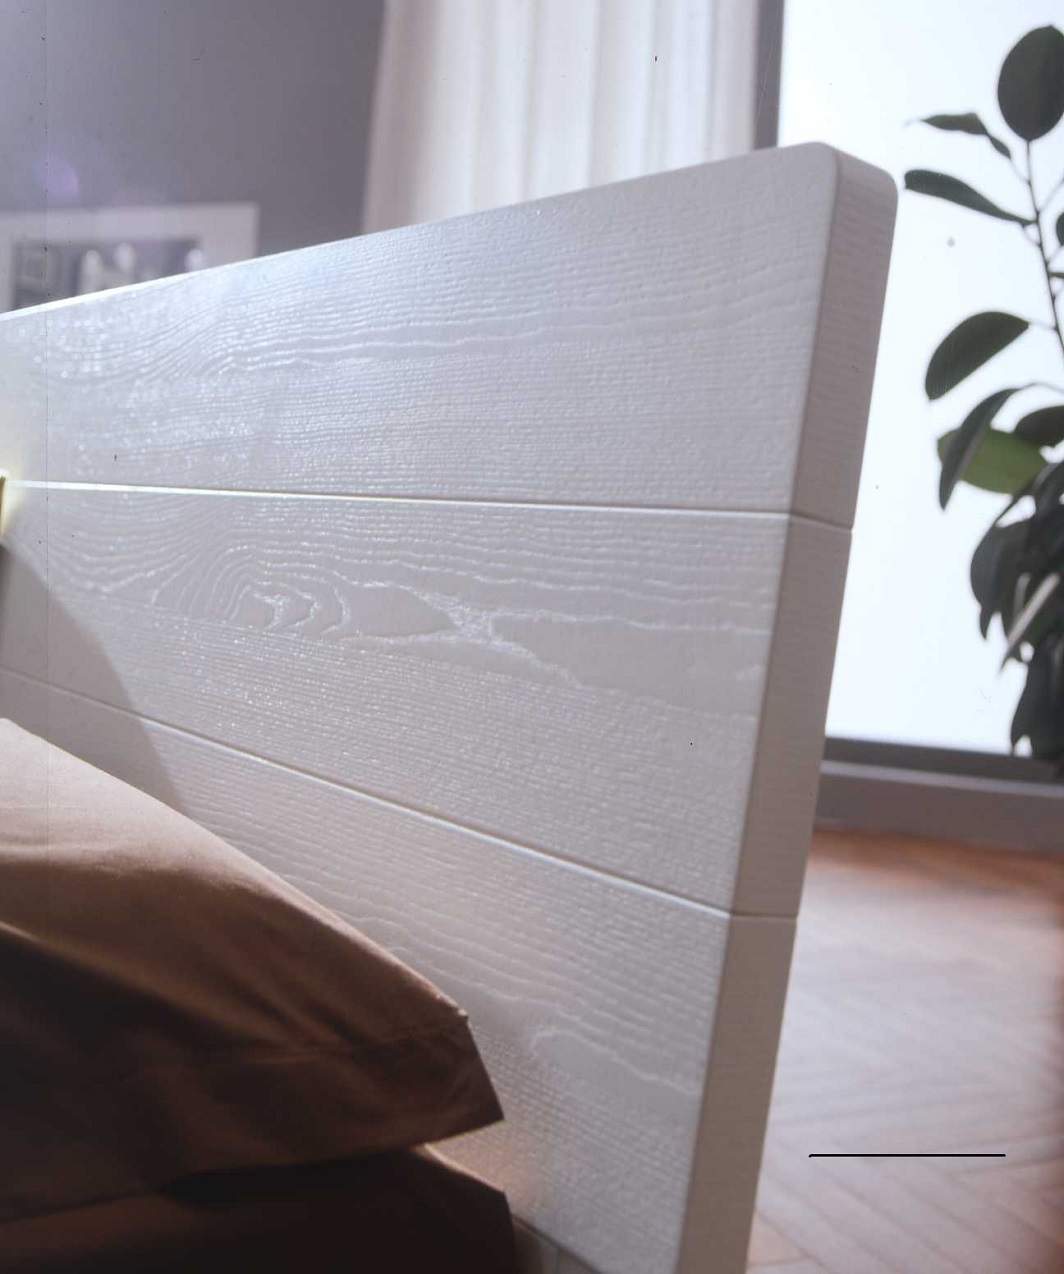 Letto cenedese blink matrimoniale moderno legno letti a - Letto matrimoniale moderno in legno ...